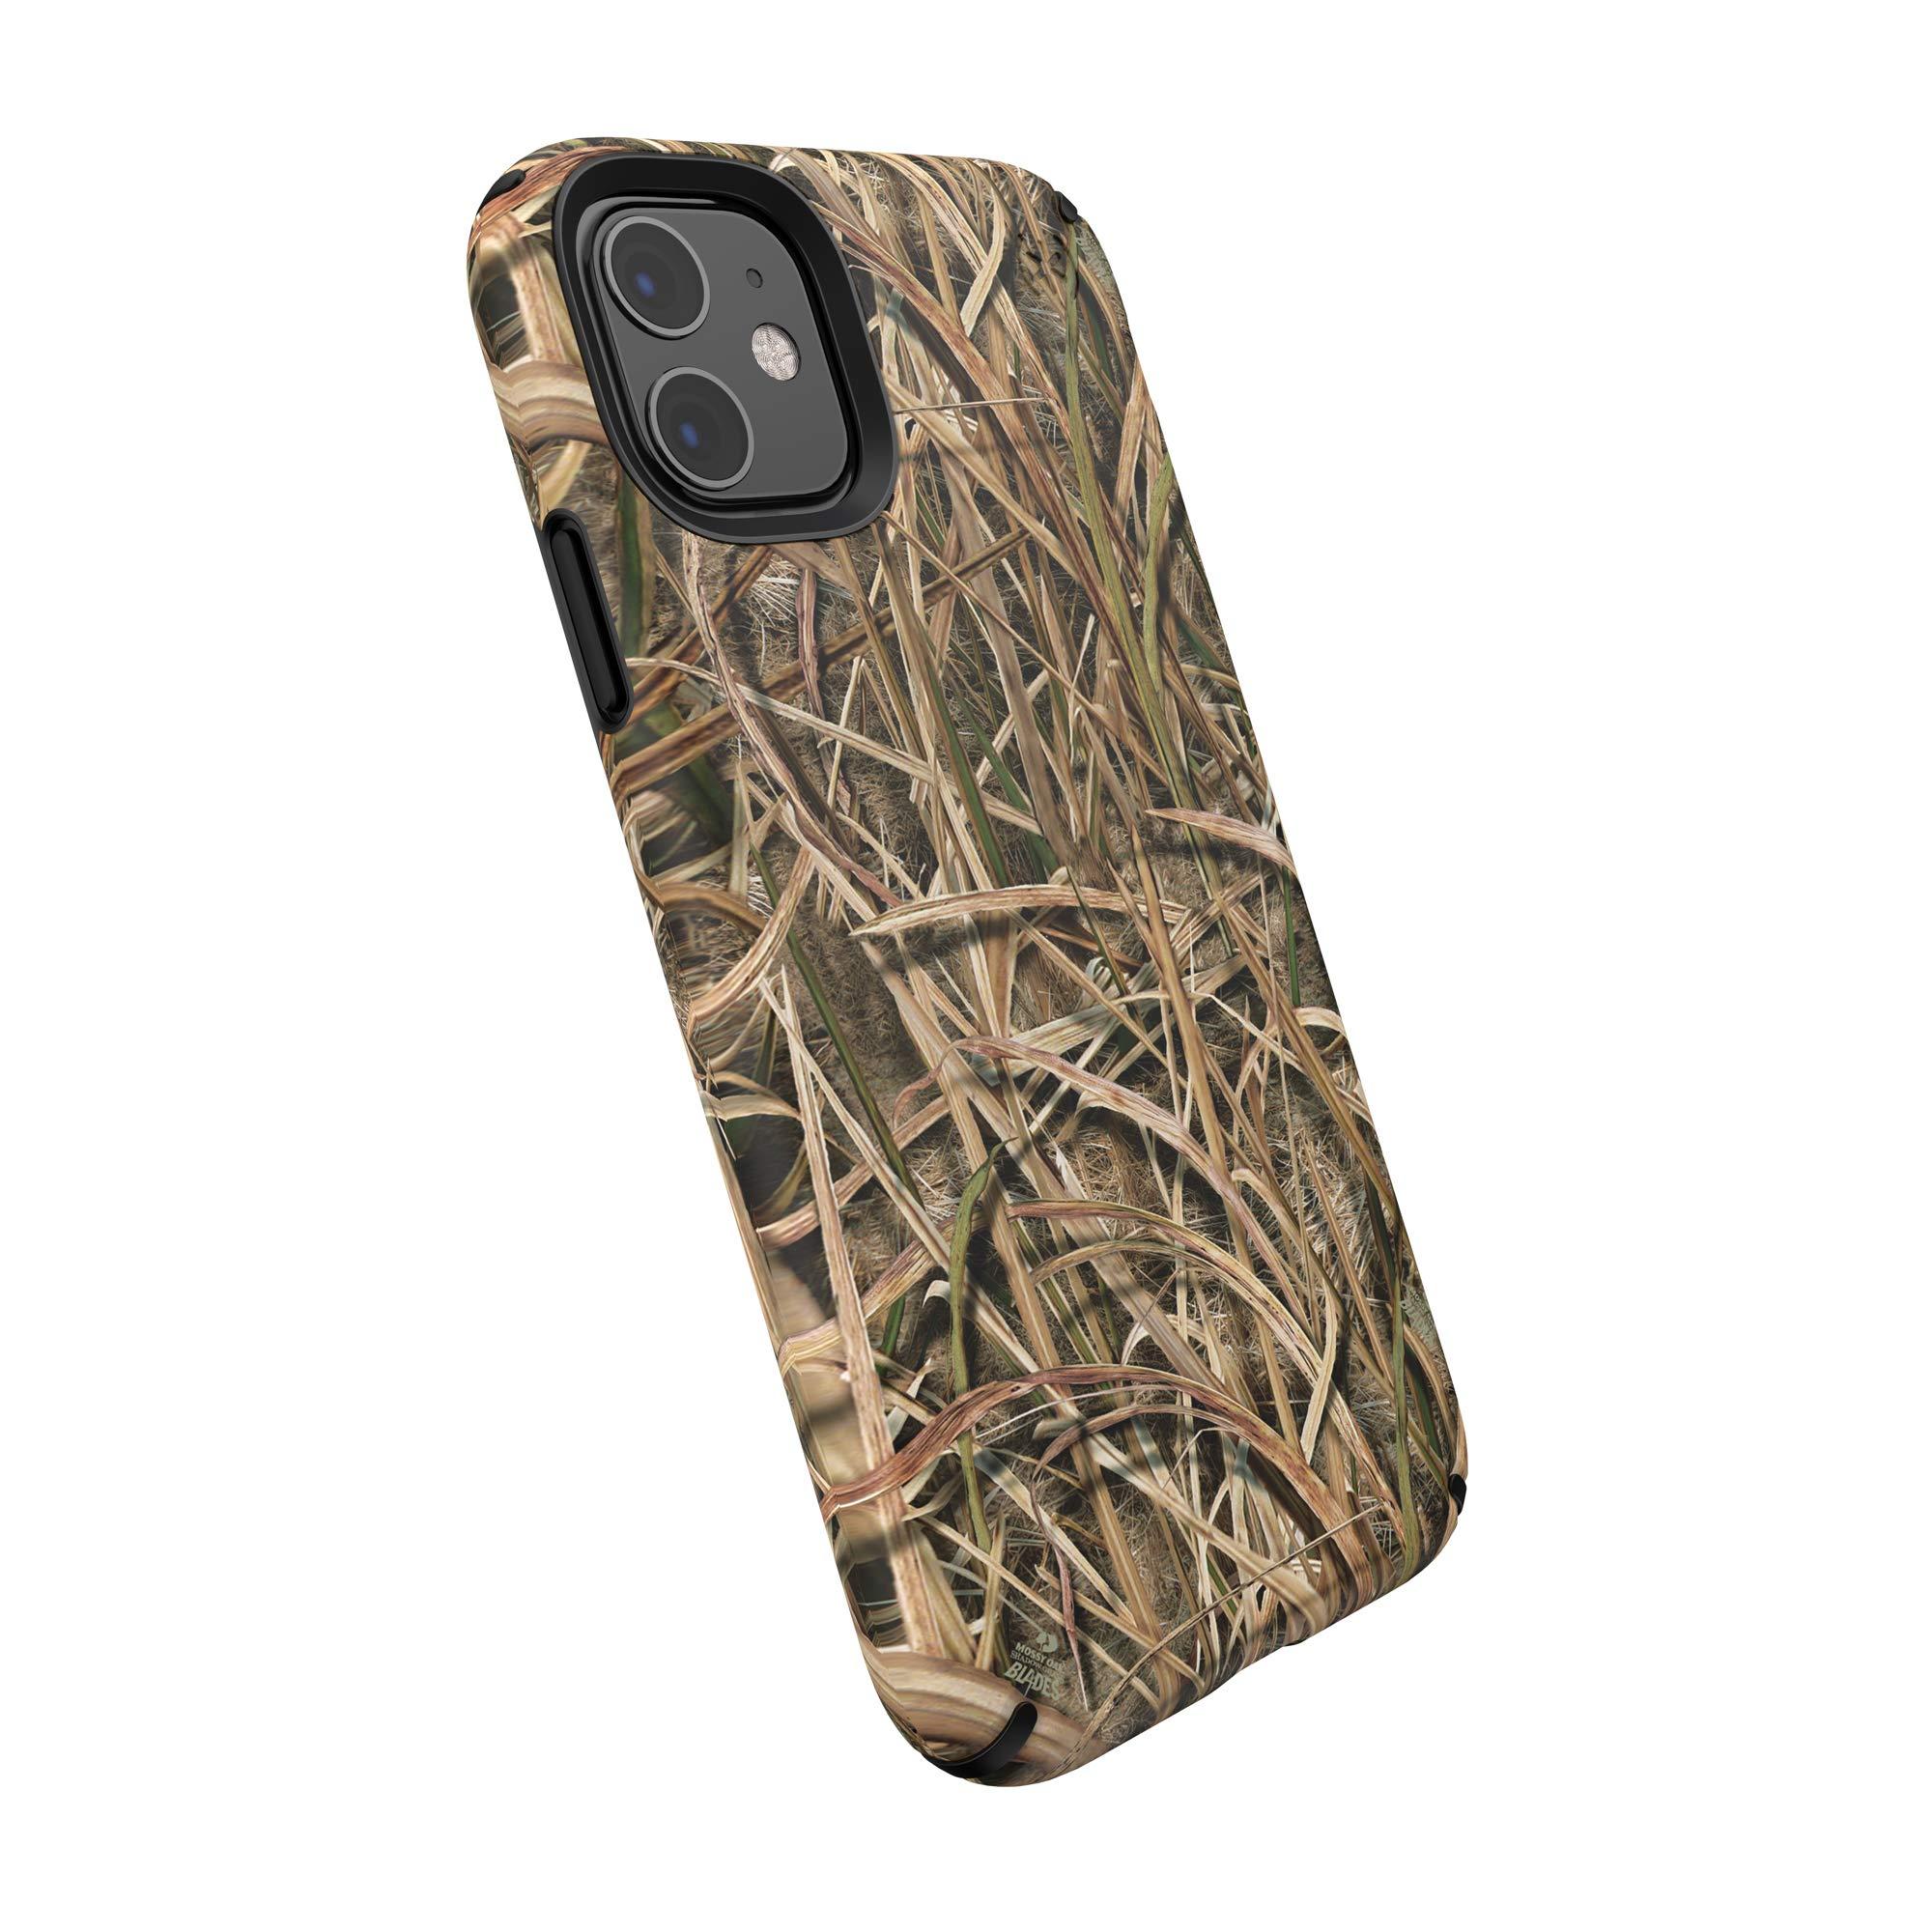 Speck Presidio Inked iPhone 11 Case, Mossy Oak Shadow Grass Blades/Black